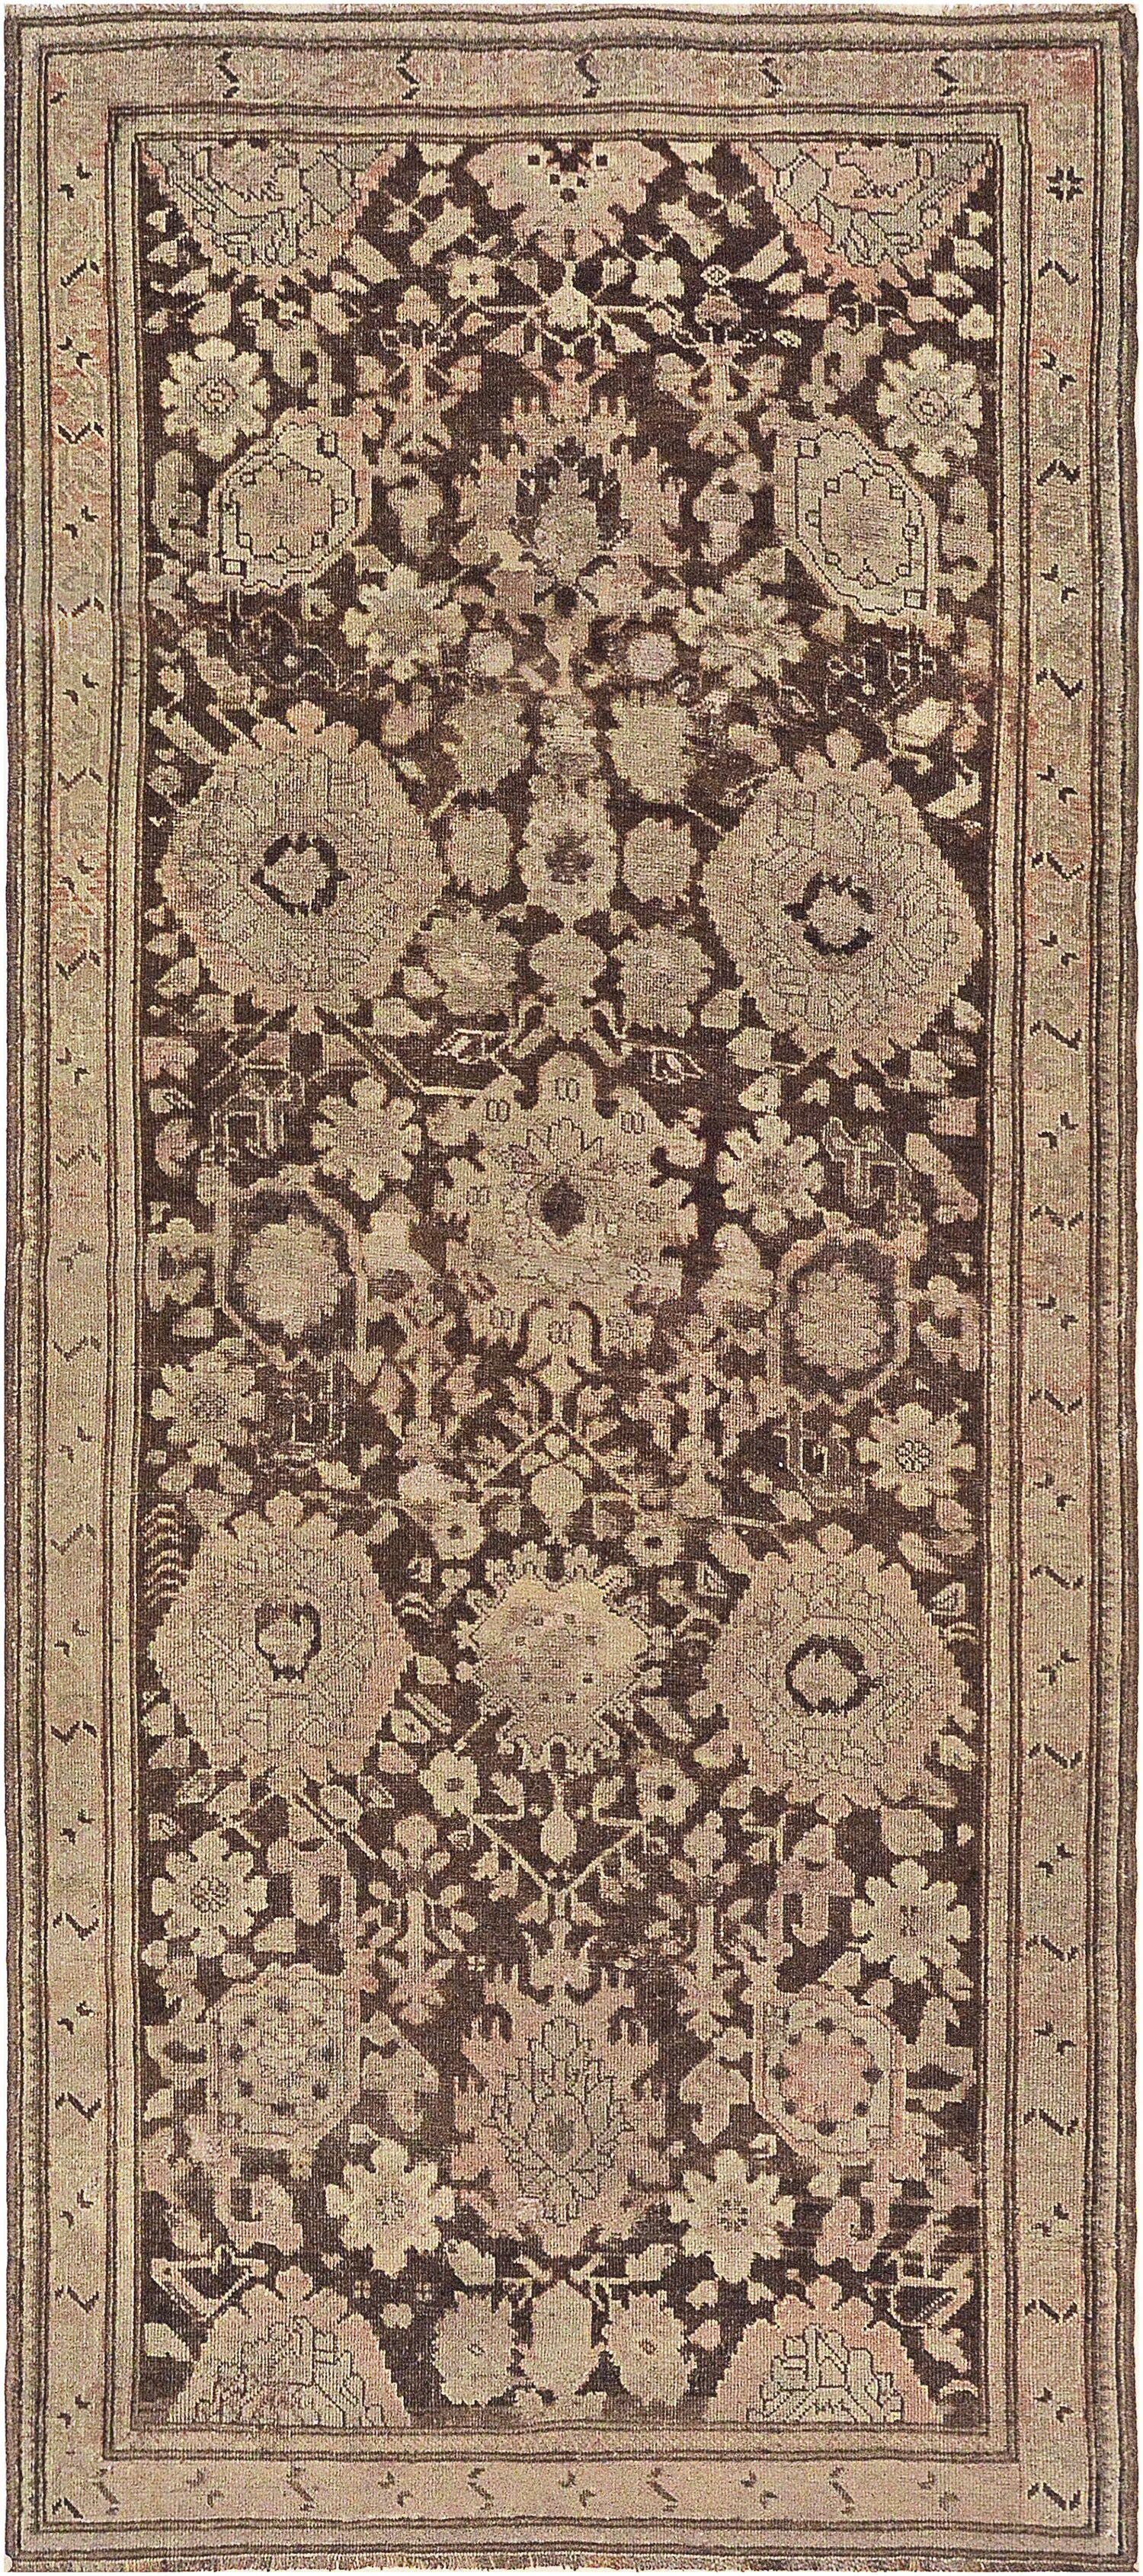 One-of-a-Kind Antique Karabagh Handwoven Wool Brown Indoor Area Rug